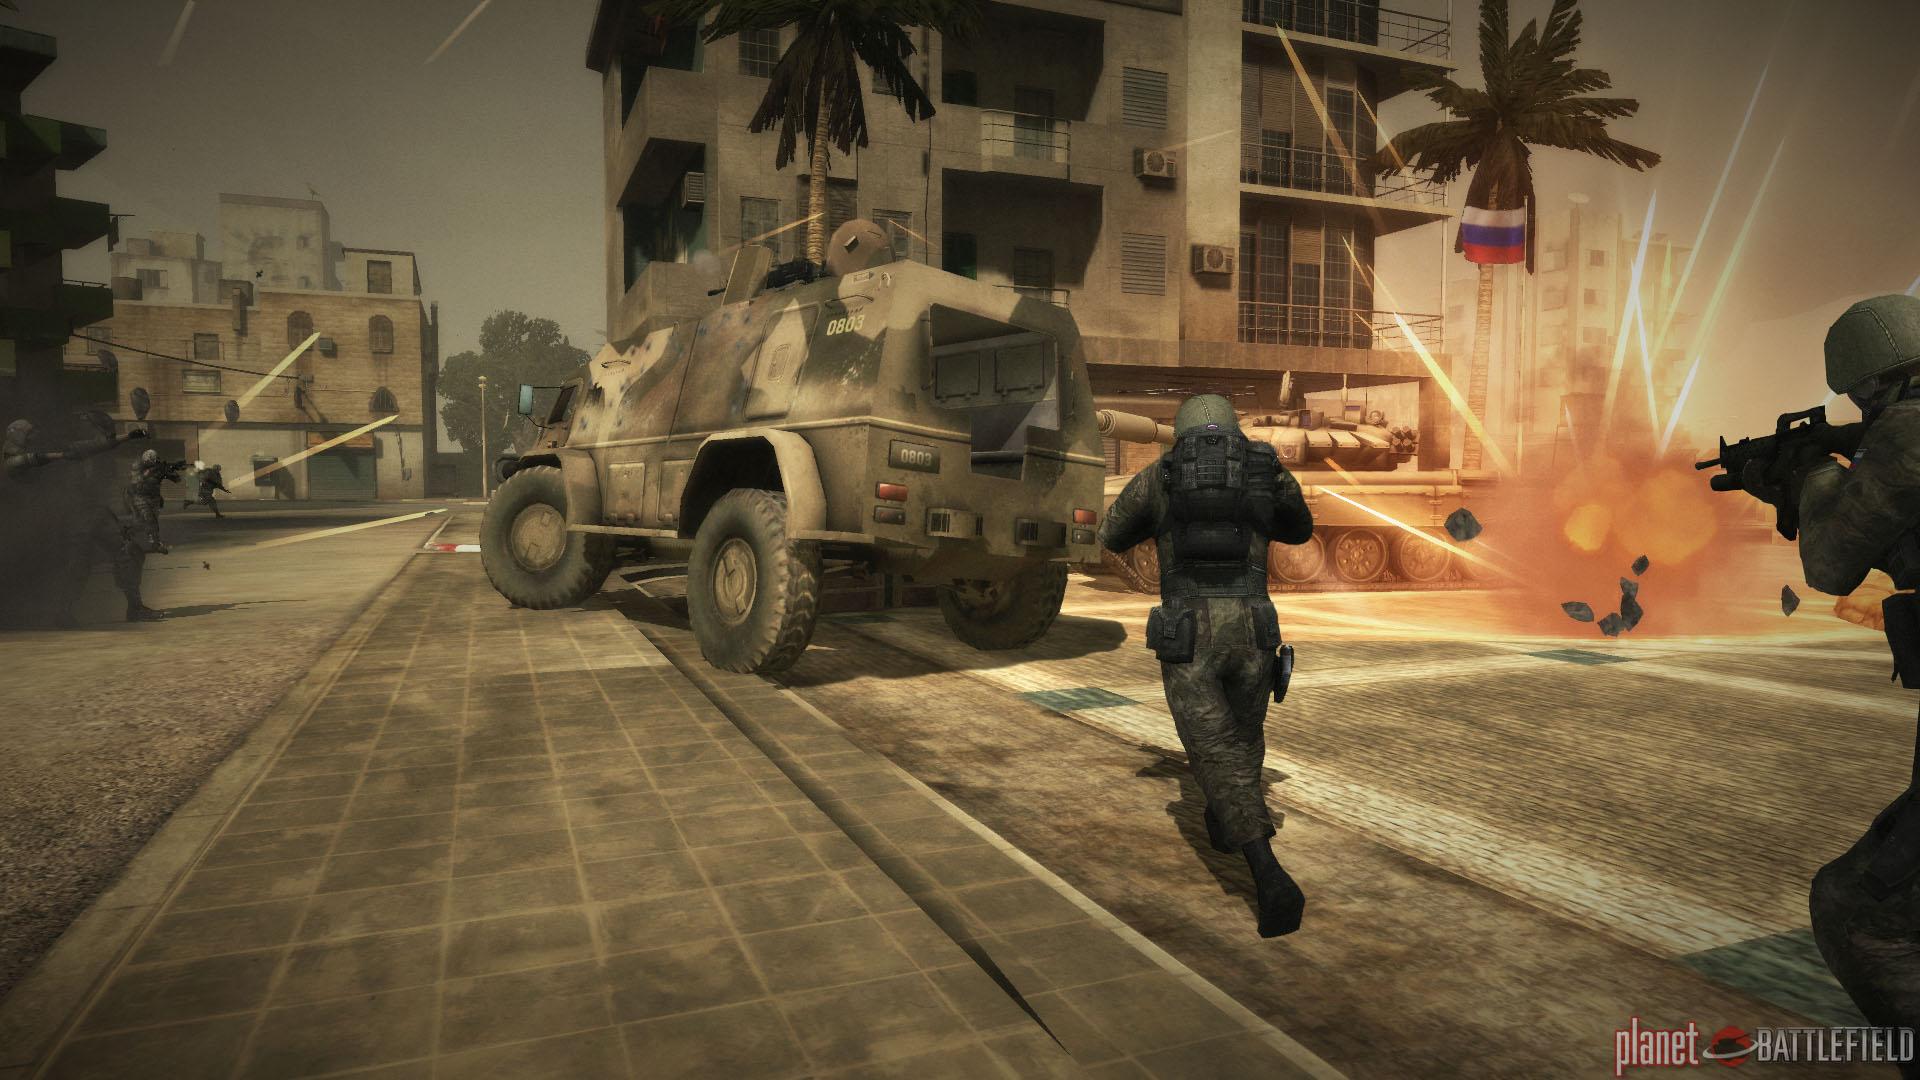 http://pnmedia.gamespy.com/planetbattlefield.gamespy.com/images/news3/Battlefield-Play4Free_003.jpg